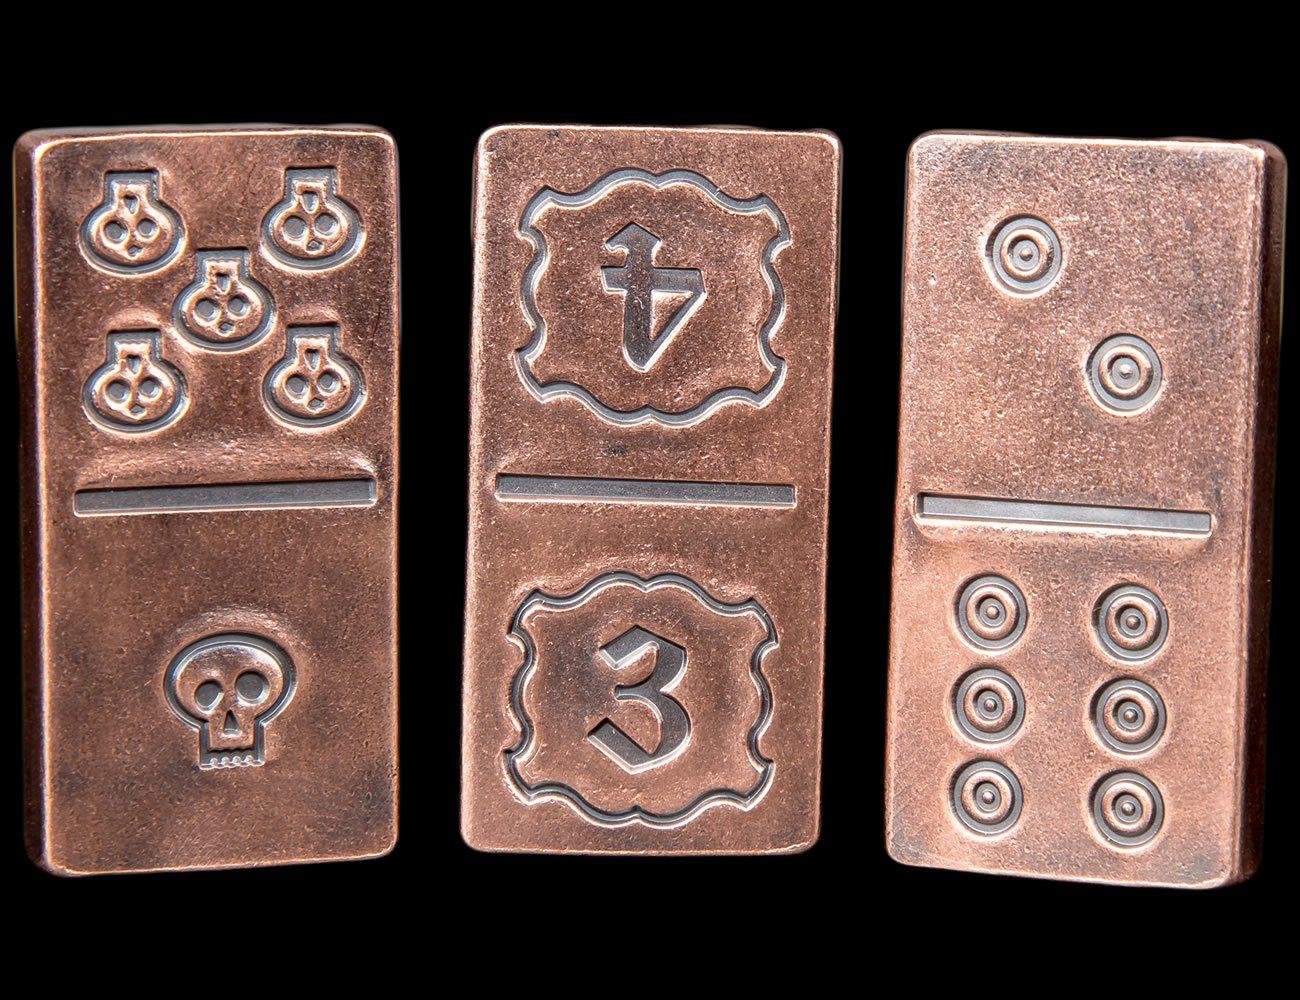 Handmade Solid Copper Metal Domino Game Set in Box & Dice